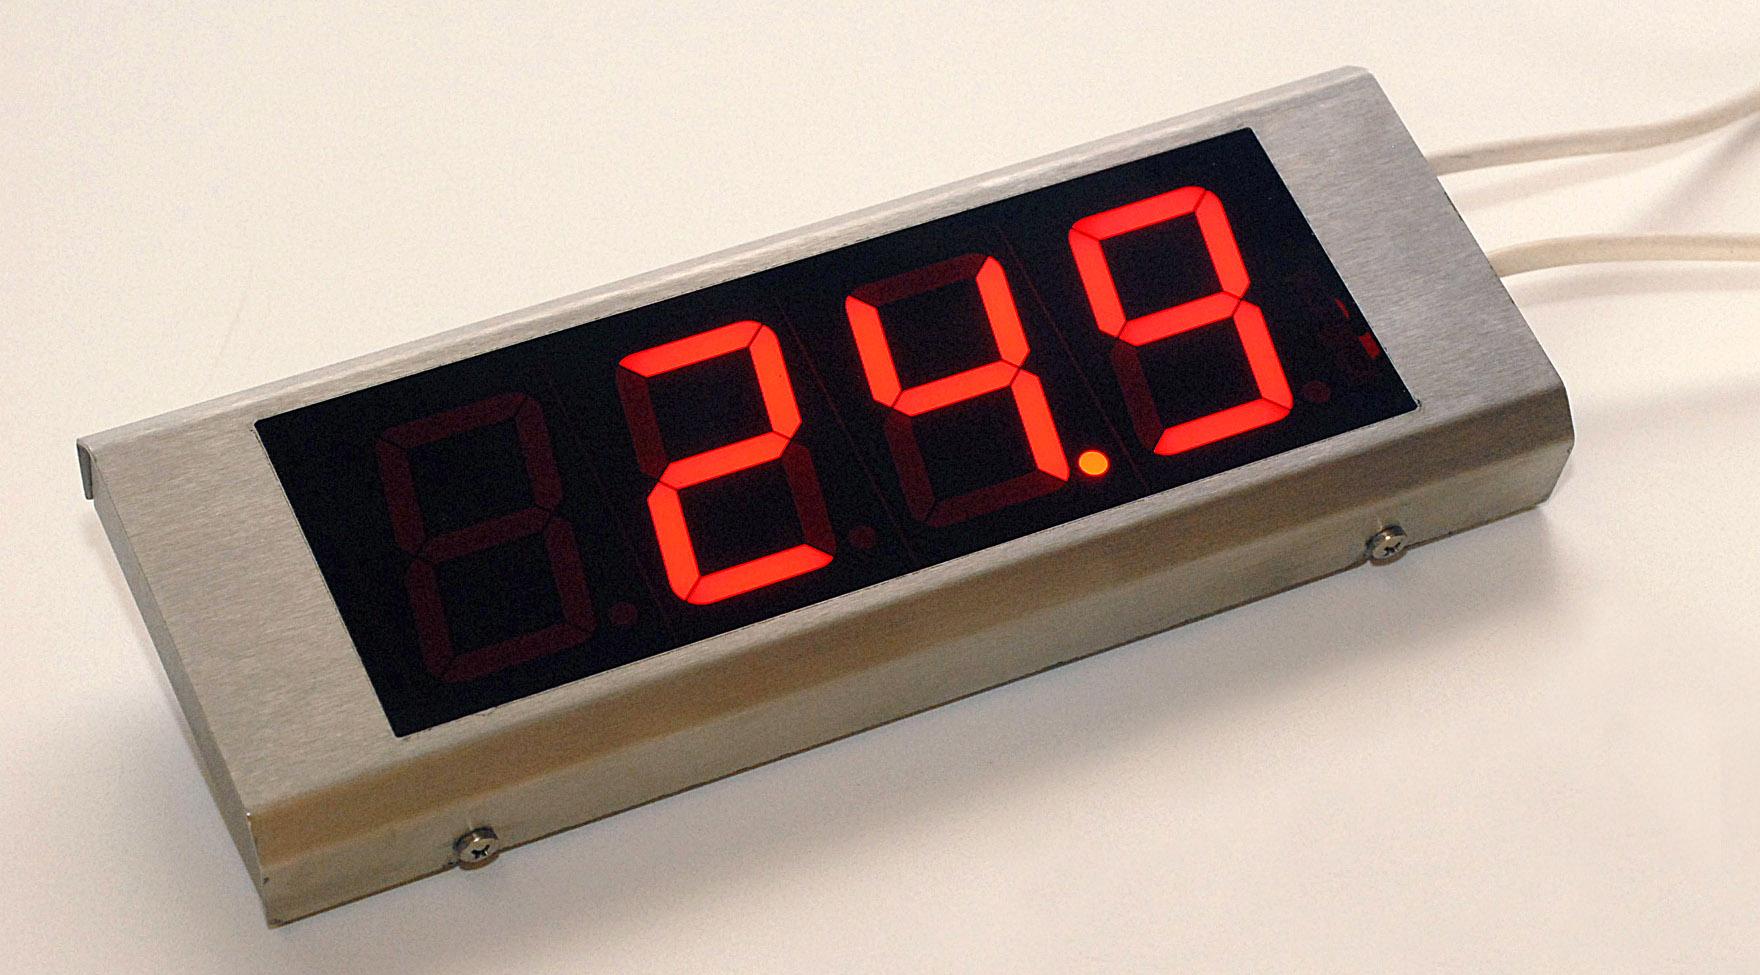 d005-termometr-cyfrowy-typ-dit-157-b-001